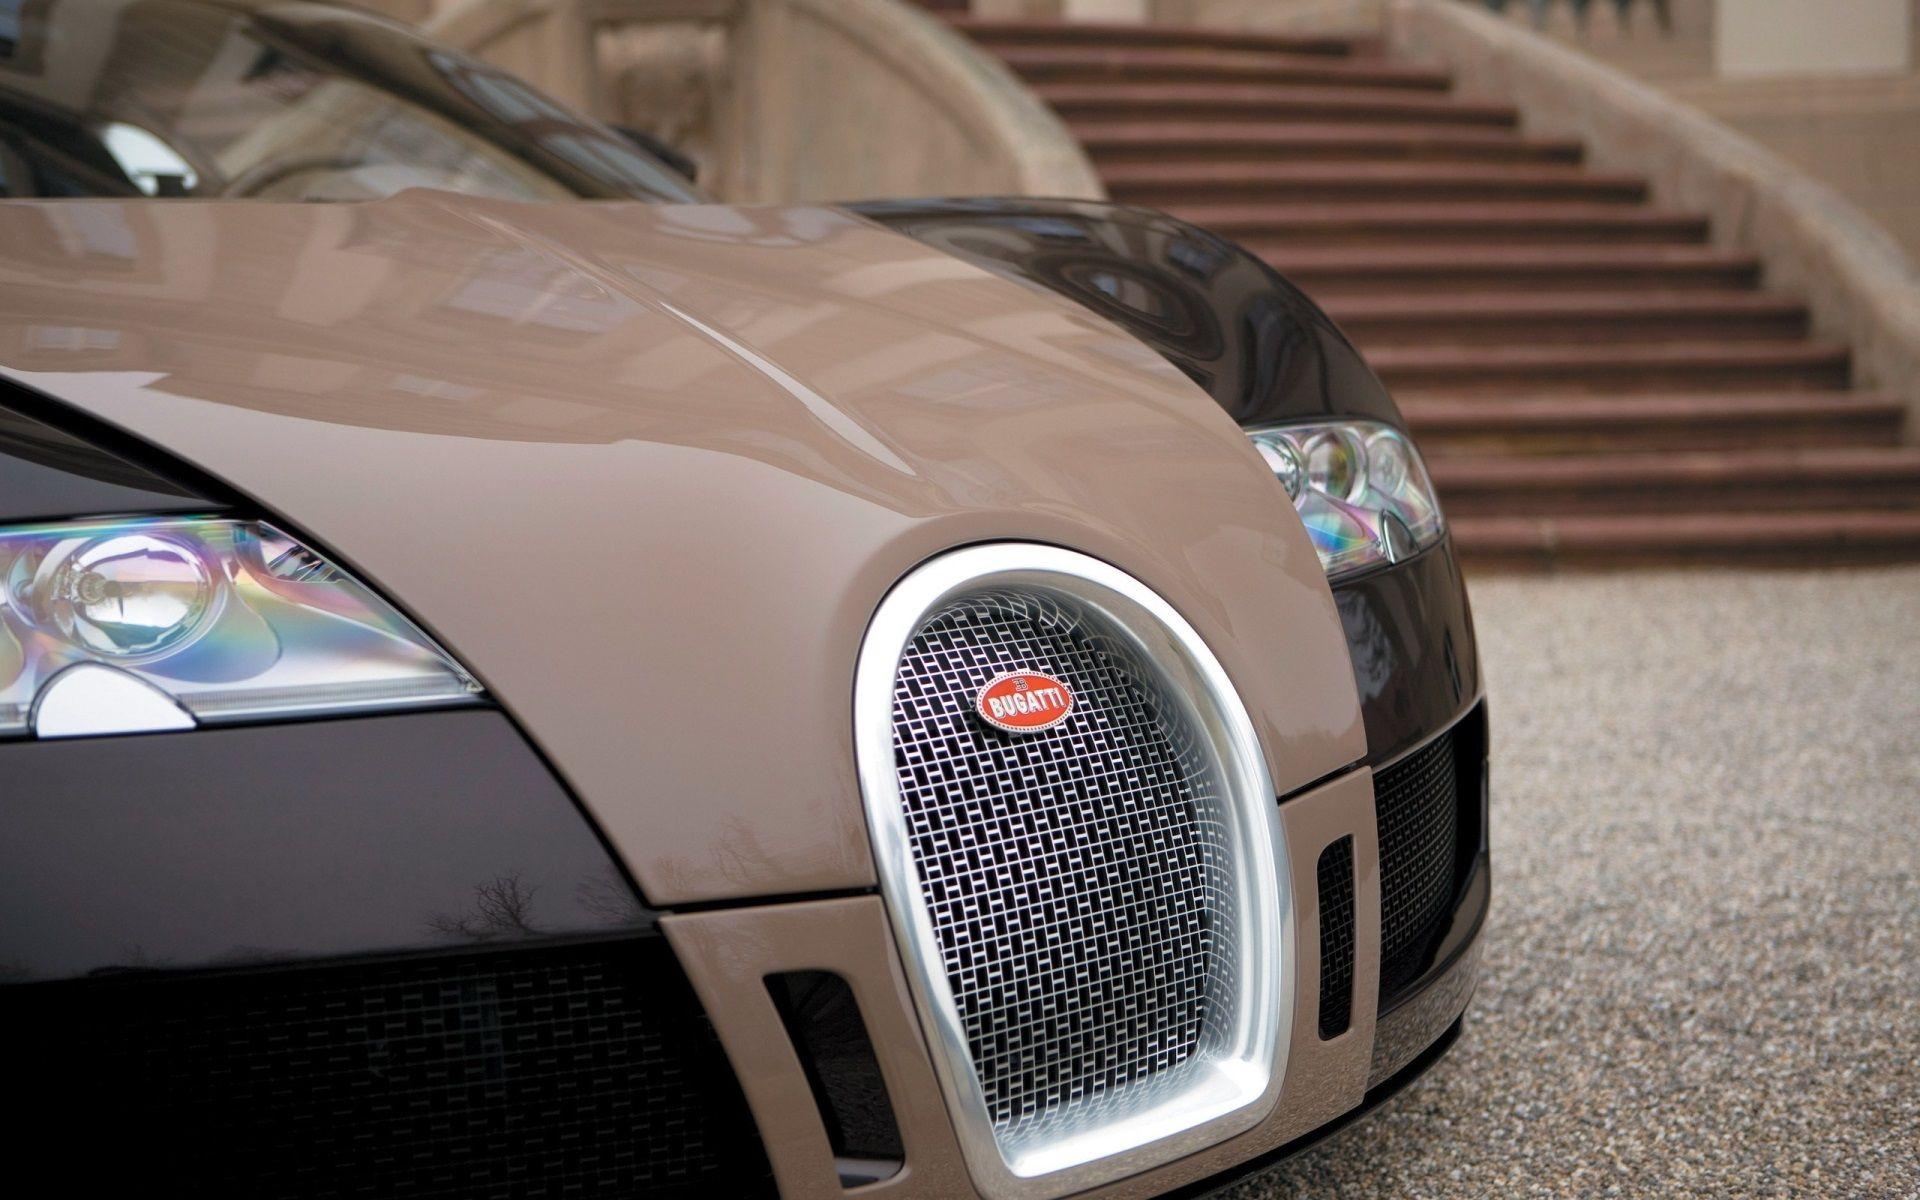 1920x1200 Bugatti Veyron Hd Latest Wallpaper Bugatti Veyron Super Sport Bugatti Veyron Cars Bugatti Veyron